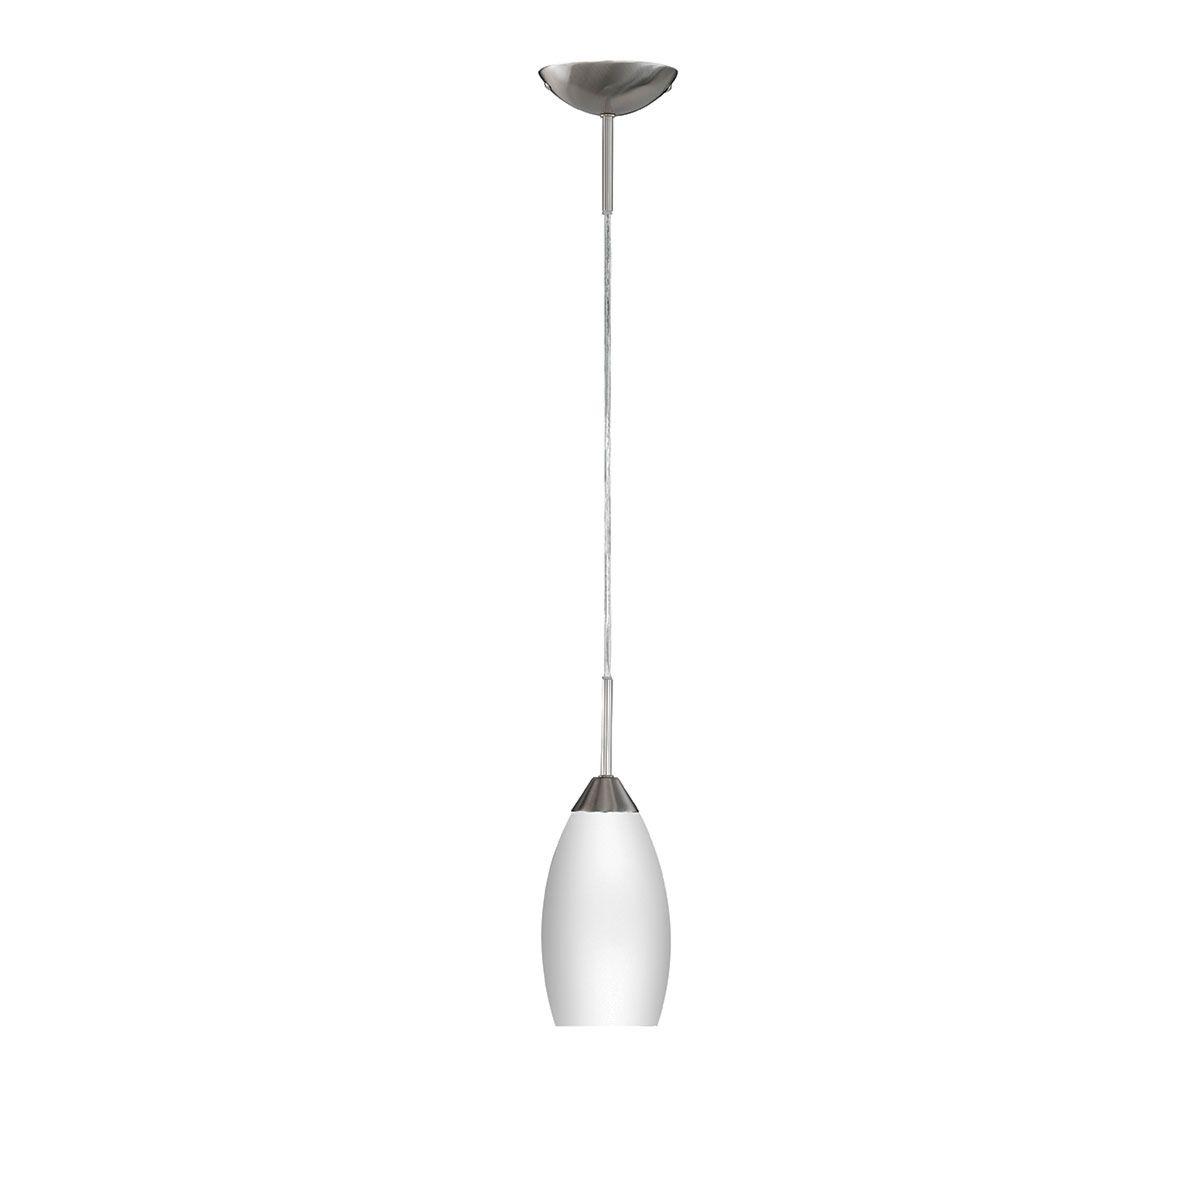 Wofi Flame Pendant Ceiling Light - Nickel Matt Finish